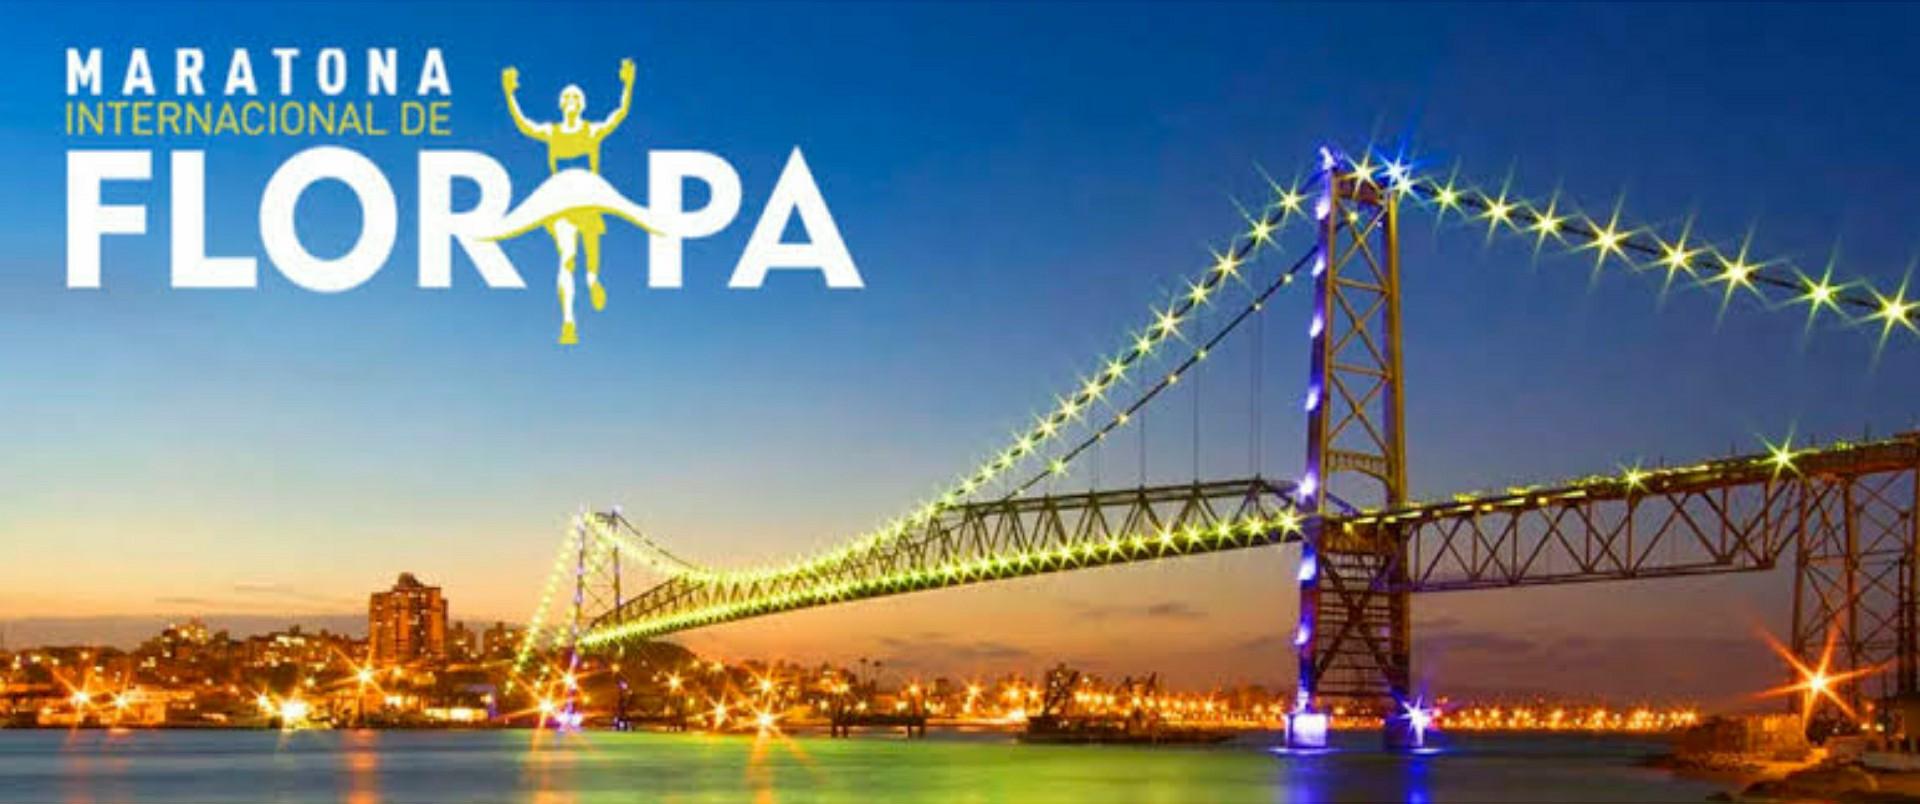 Maratona de Florianópolis